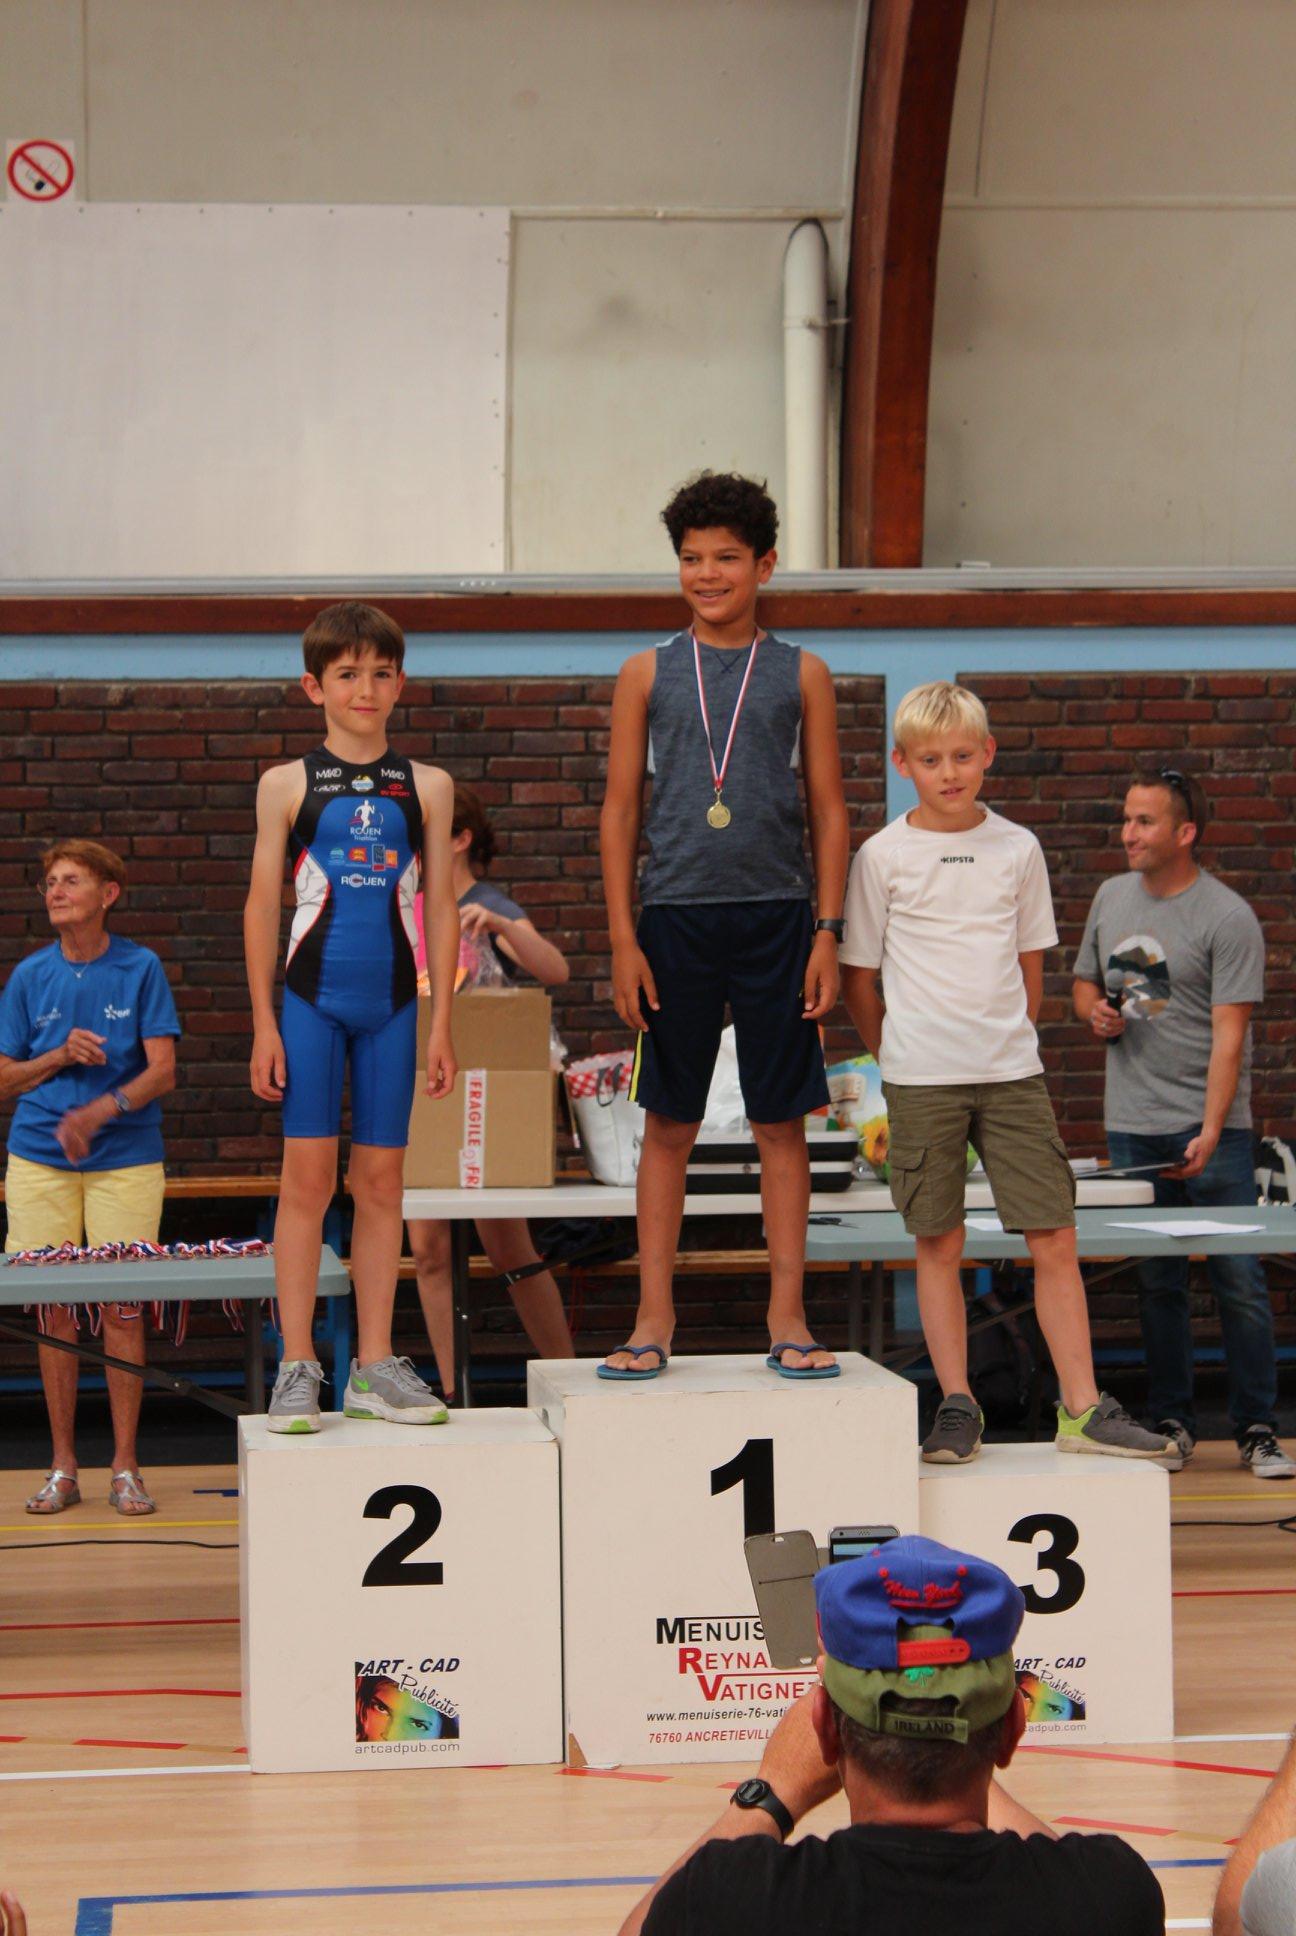 podium4.jpg